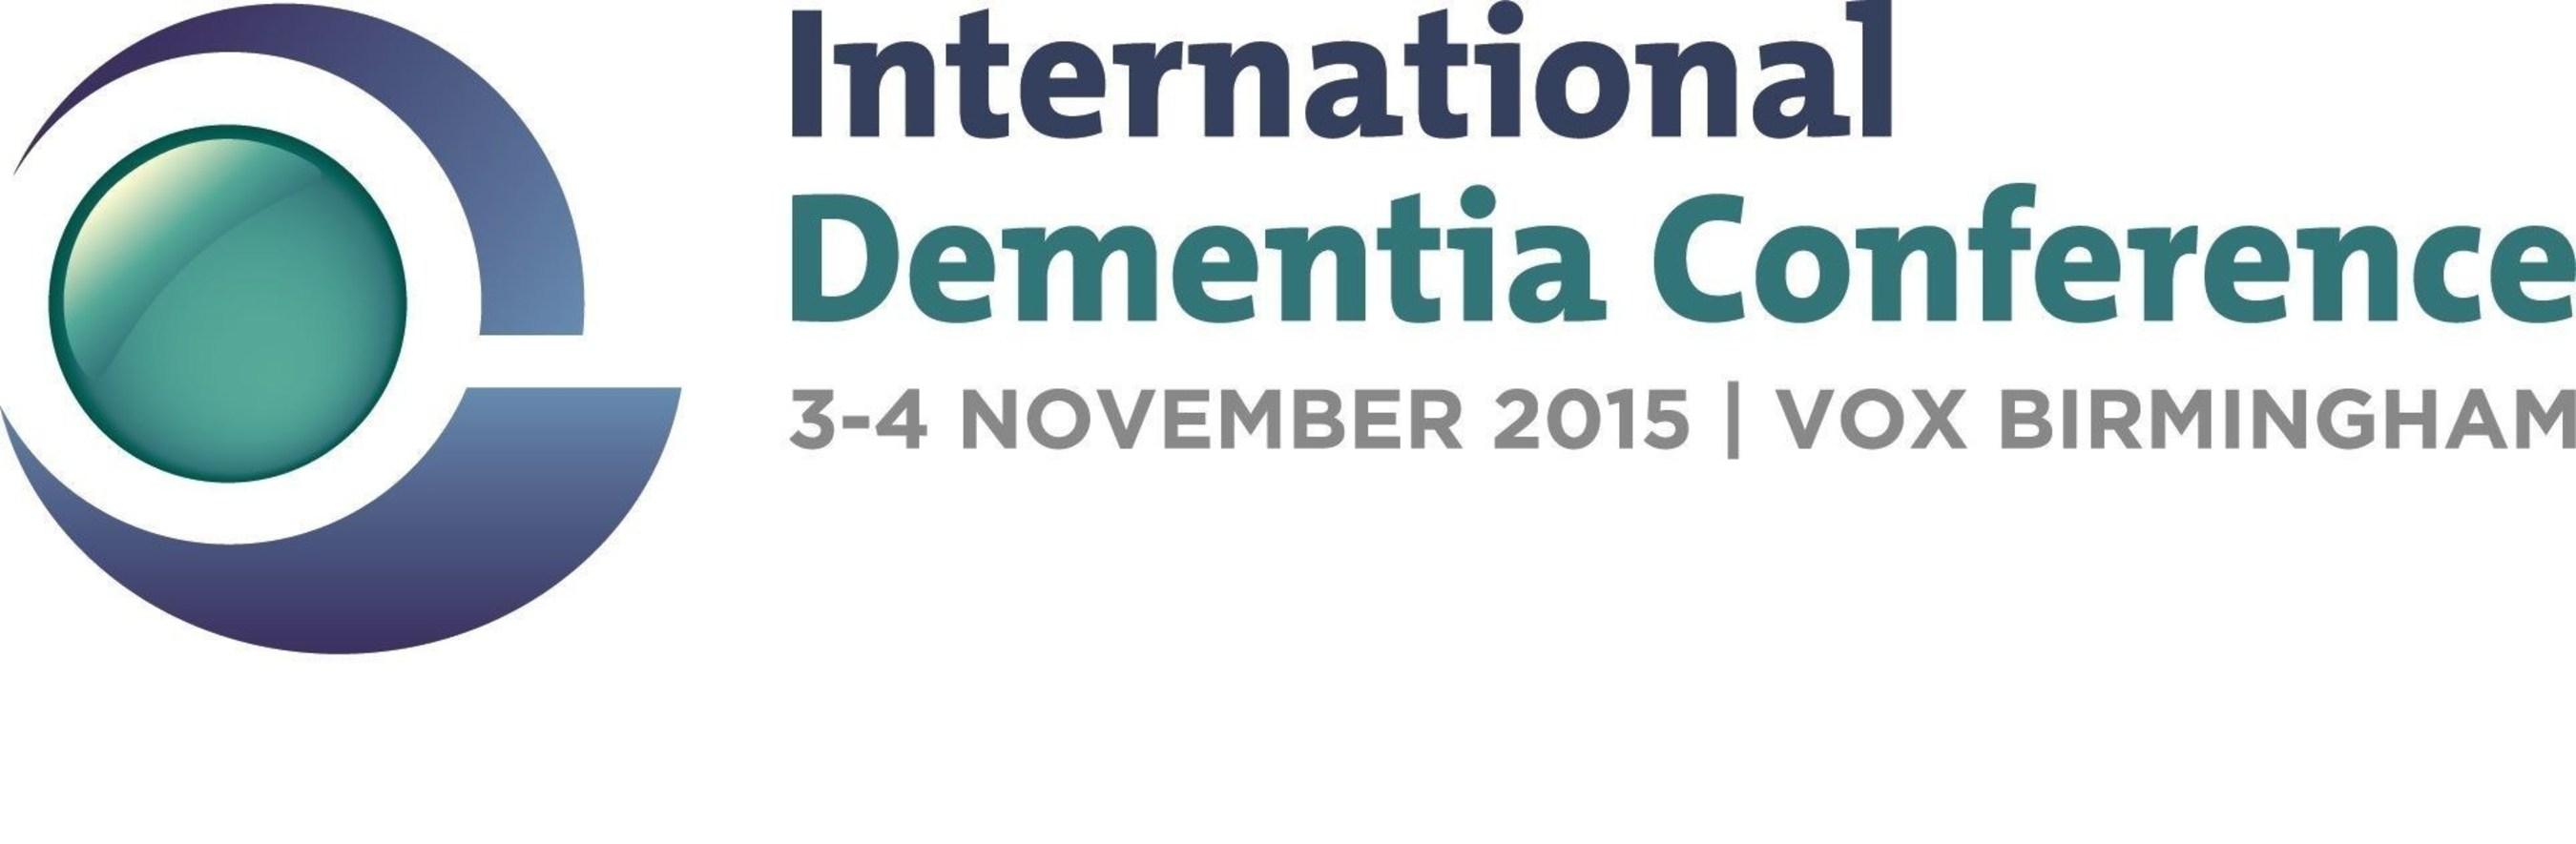 International Dementia Conference (PRNewsFoto/Care and Dementia Show) (PRNewsFoto/Care and Dementia Show)